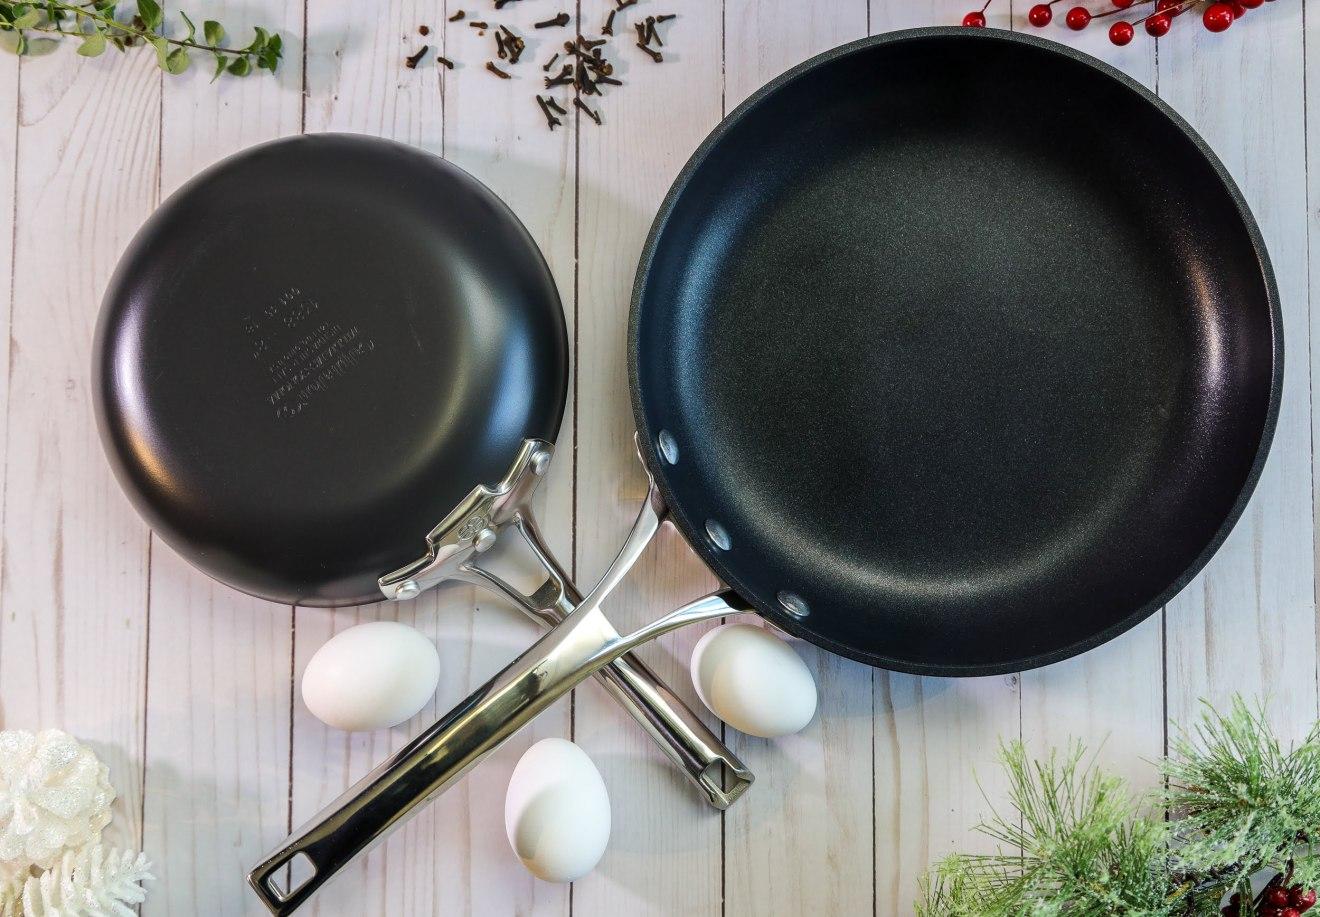 Calphalon Elite Nonstick Pans